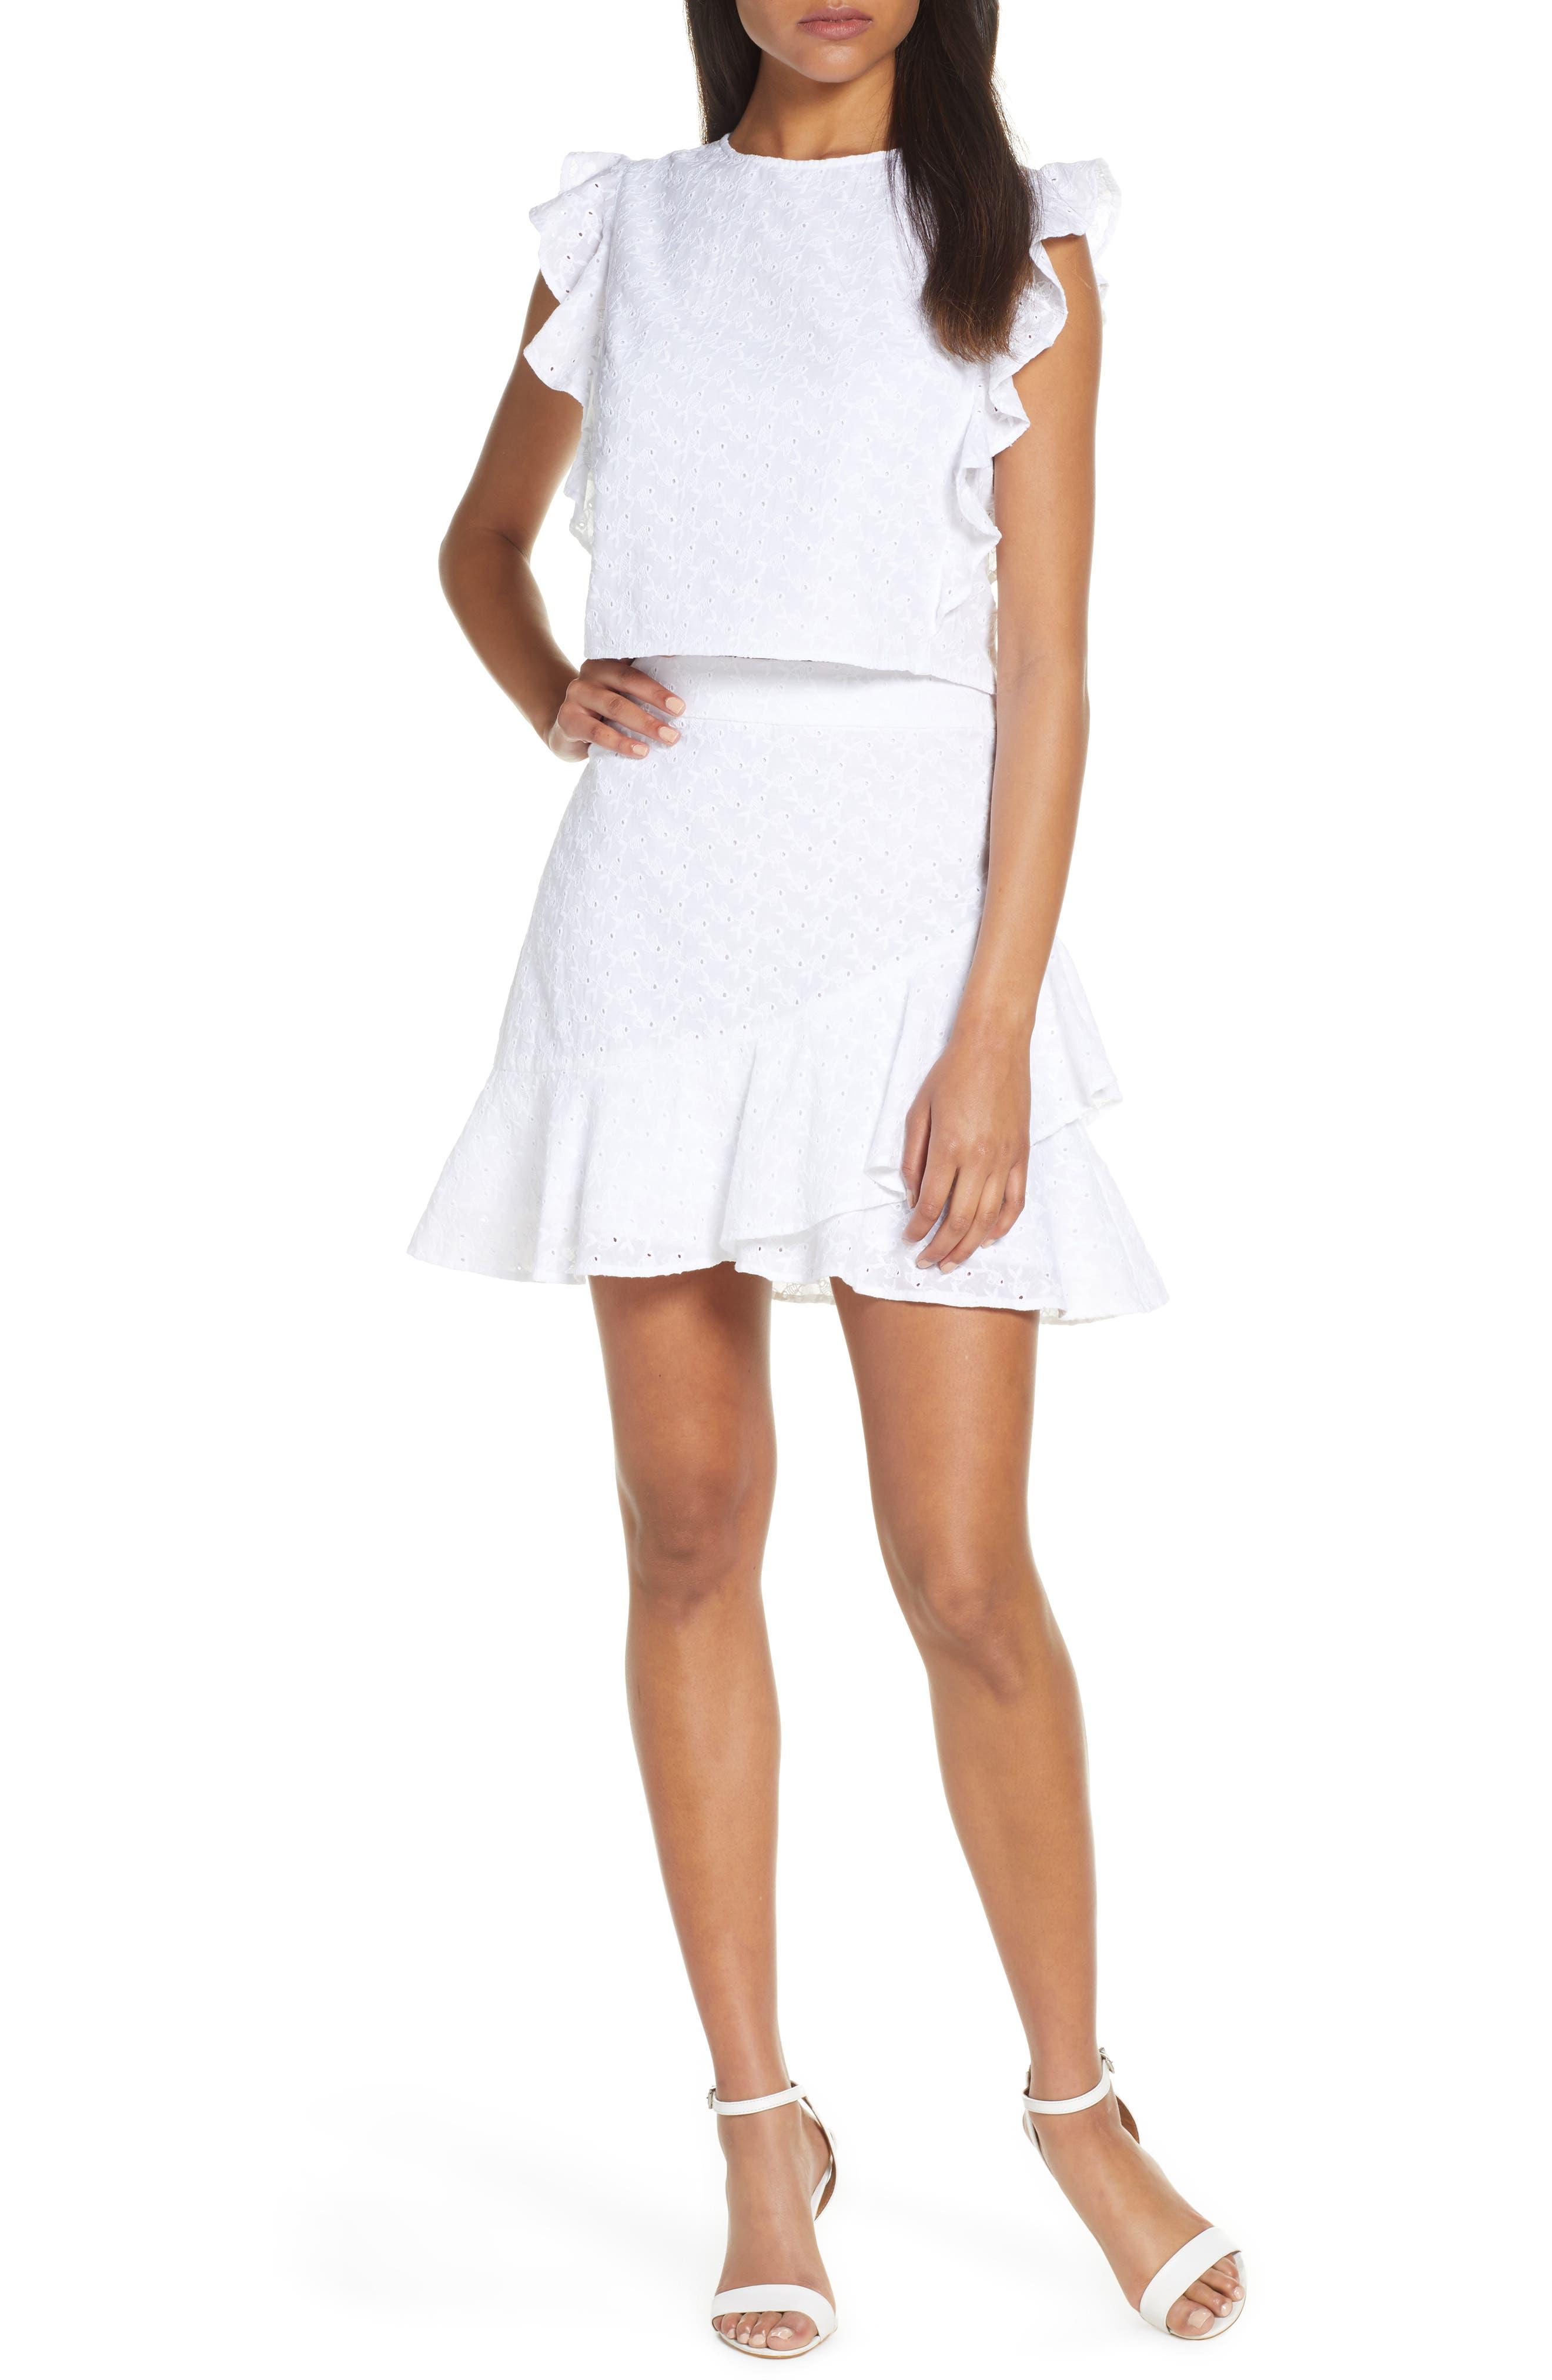 Lilly Pulitzer Alpinia Eyelet Two-Piece Dress, White